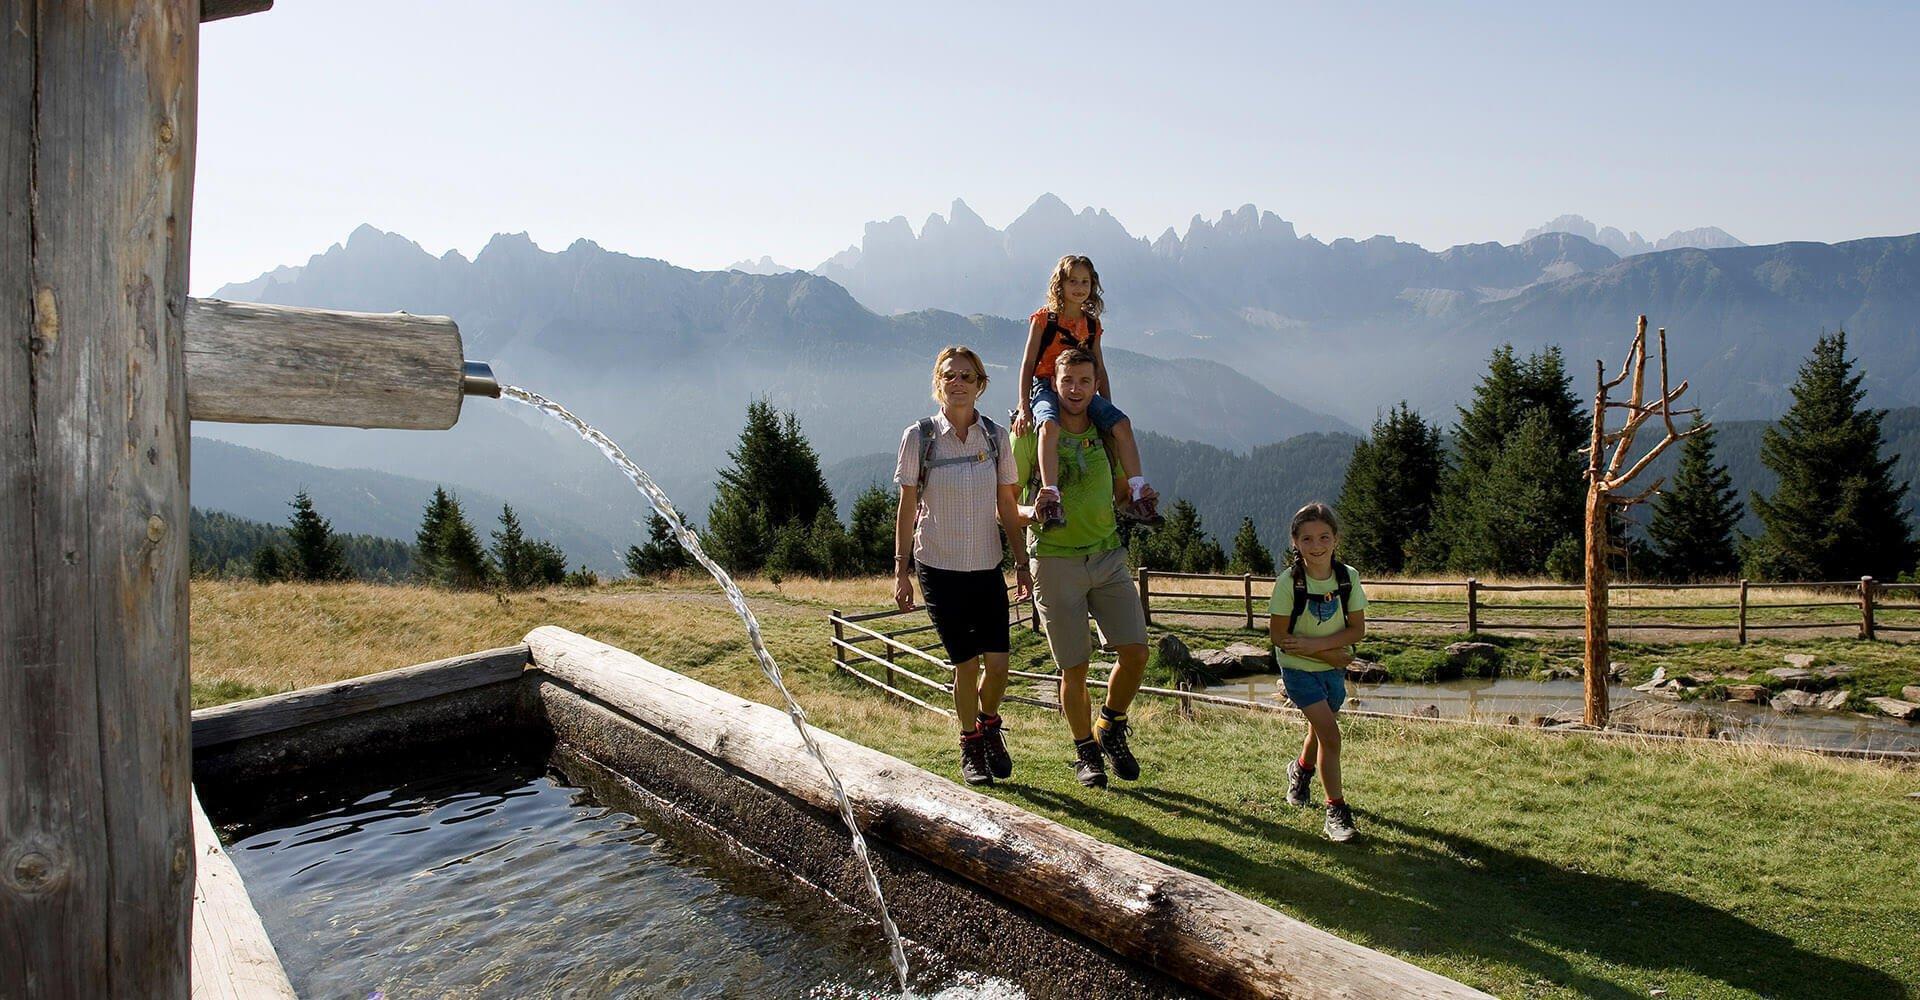 Sommerträume in den Dolomiten